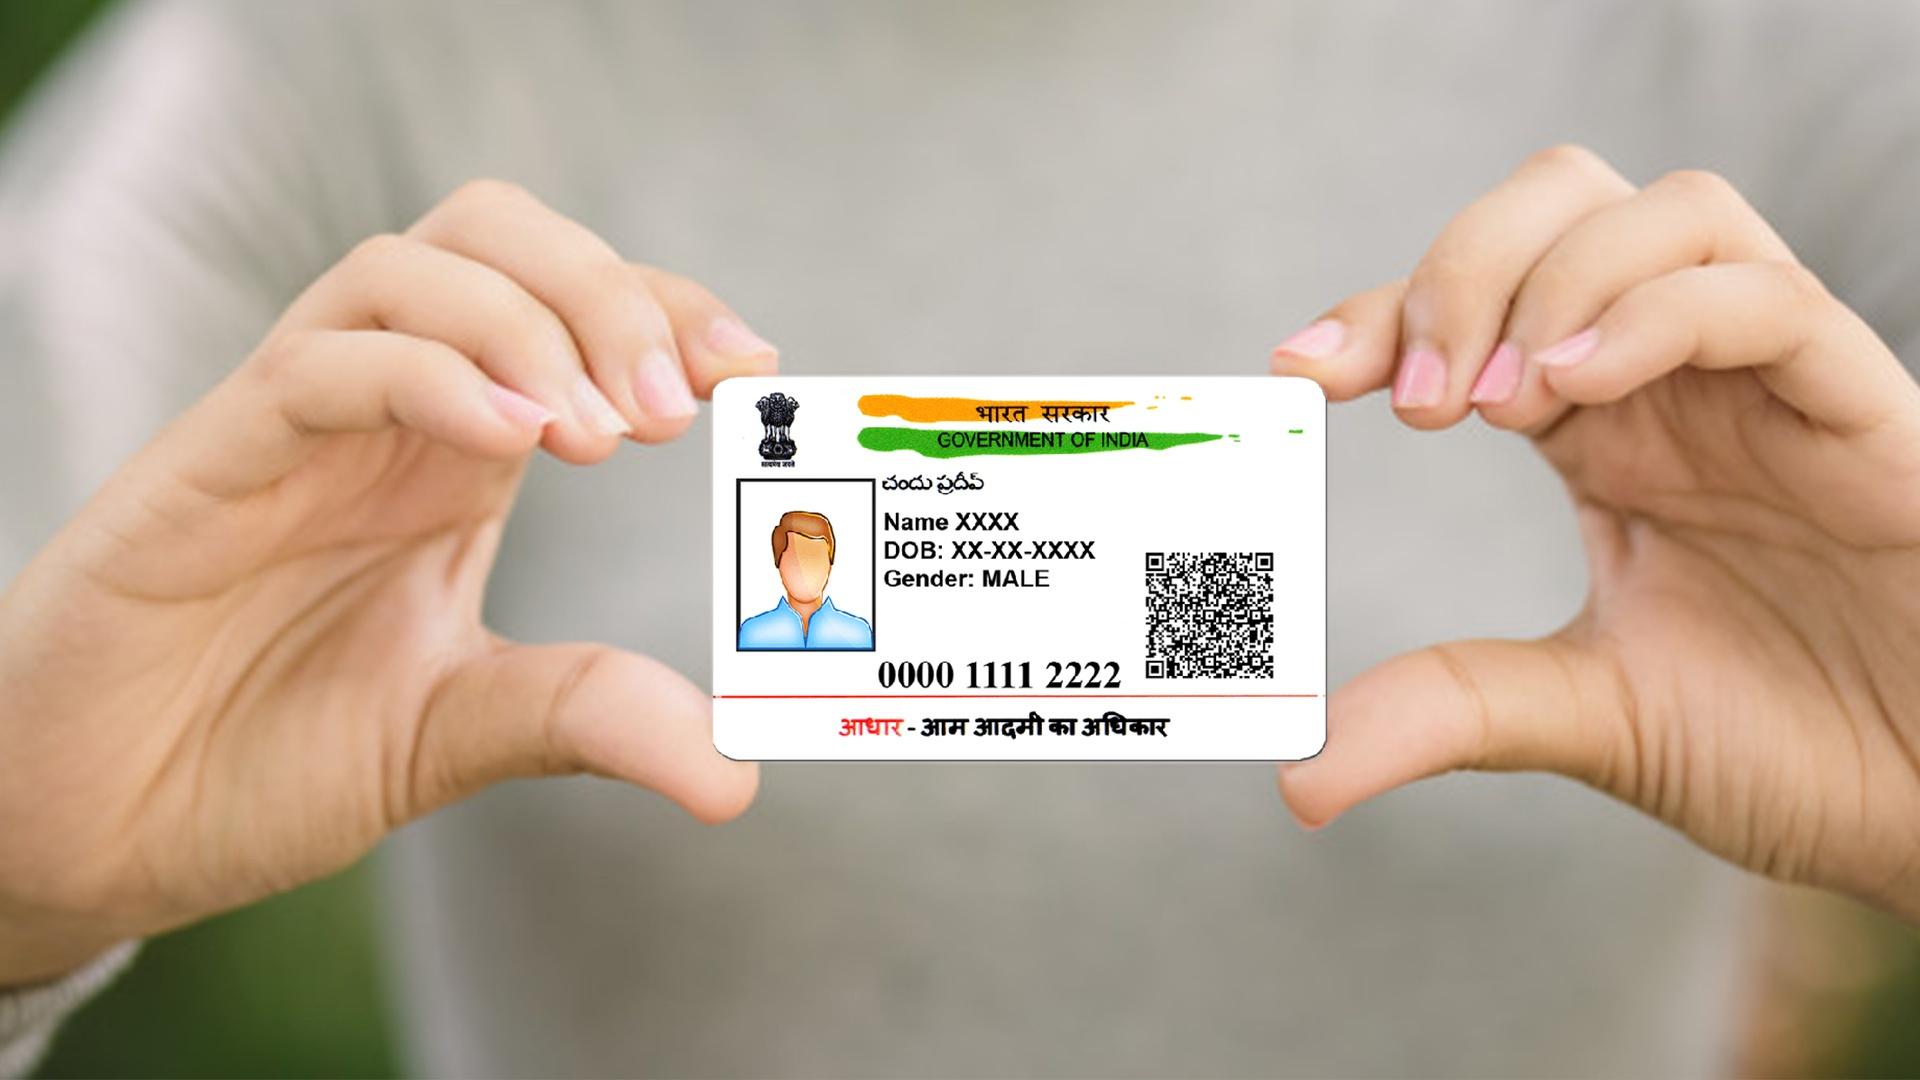 Insurance Companies Can Voluntarily Verify Aadhar Data ...